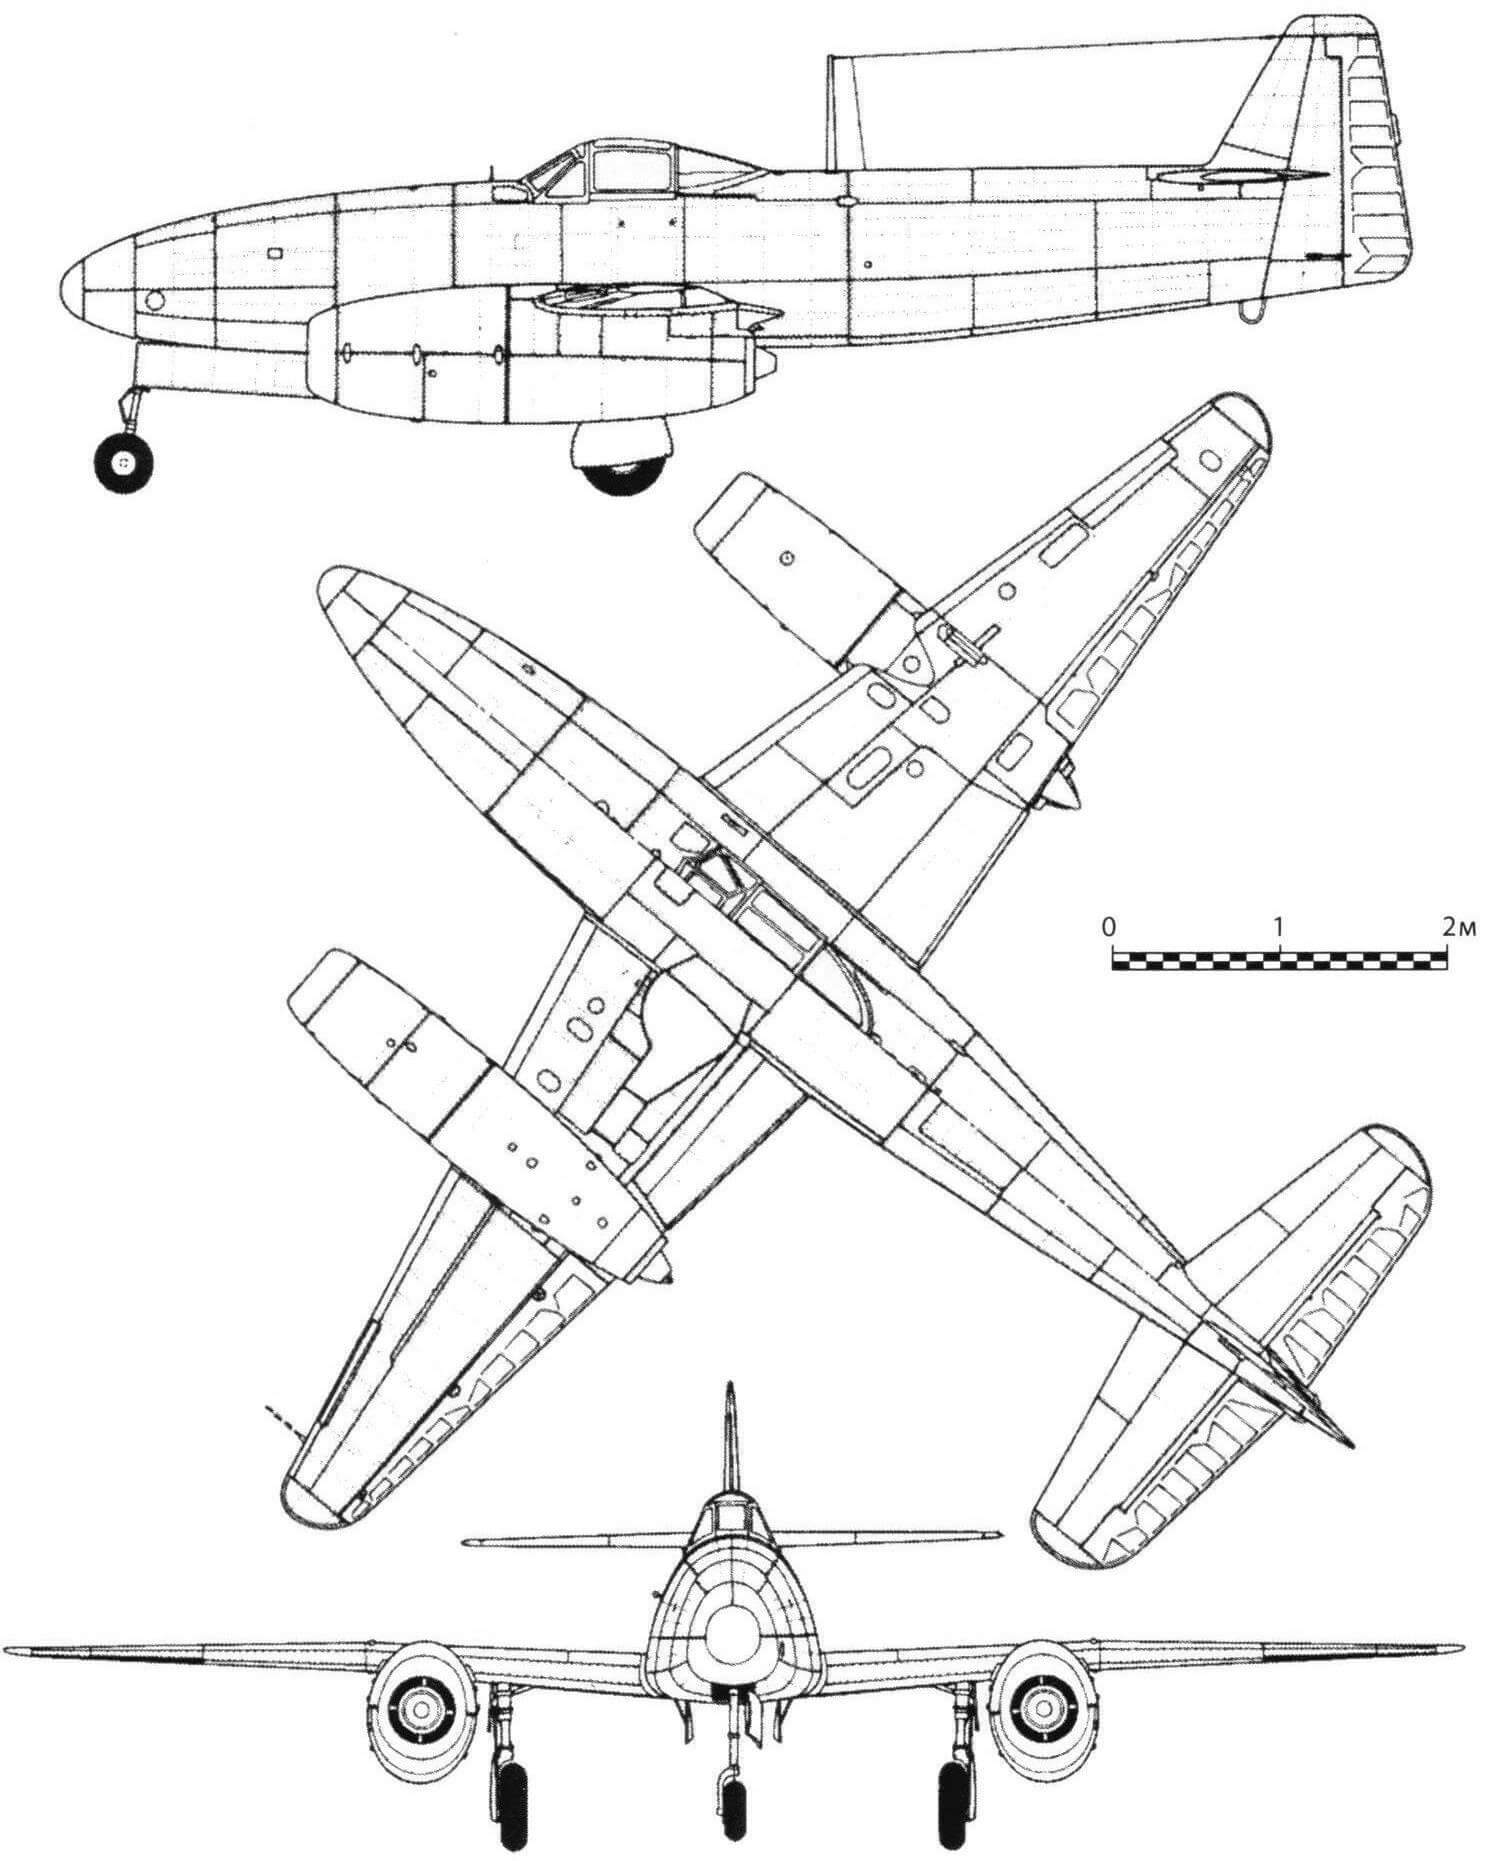 Nakajima J9Y1 Kikka